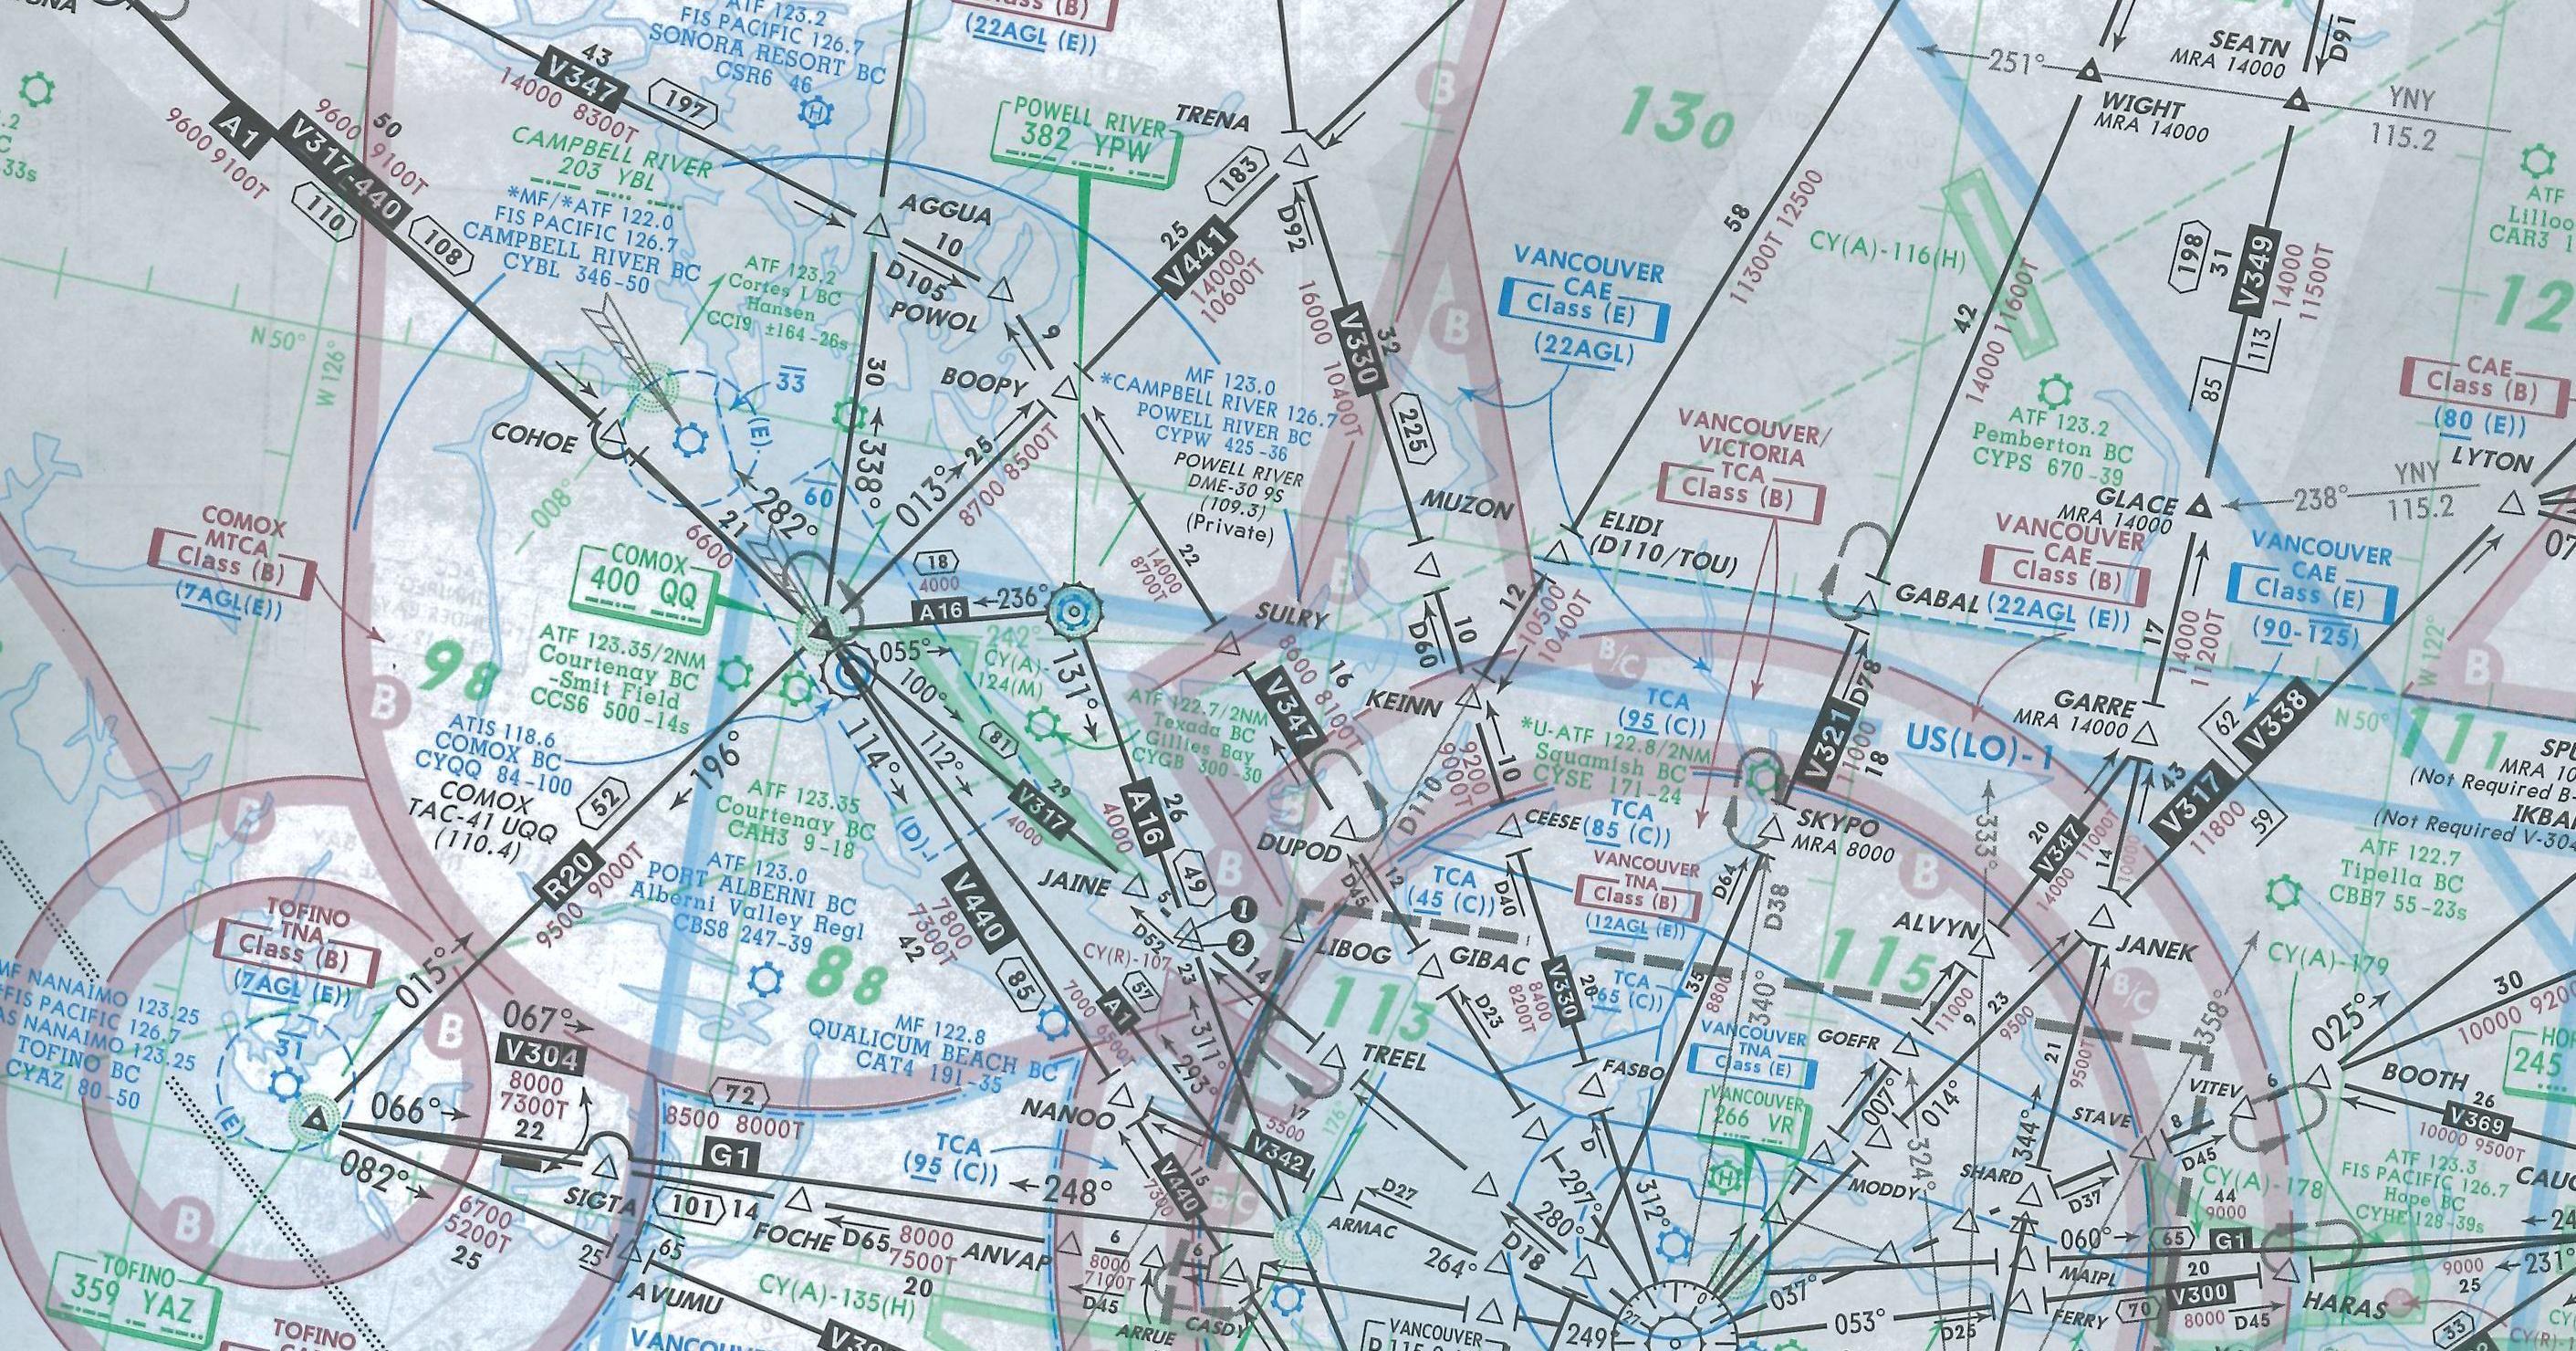 Room Mapper map room, ifr georgia strait, langley flying school | maps